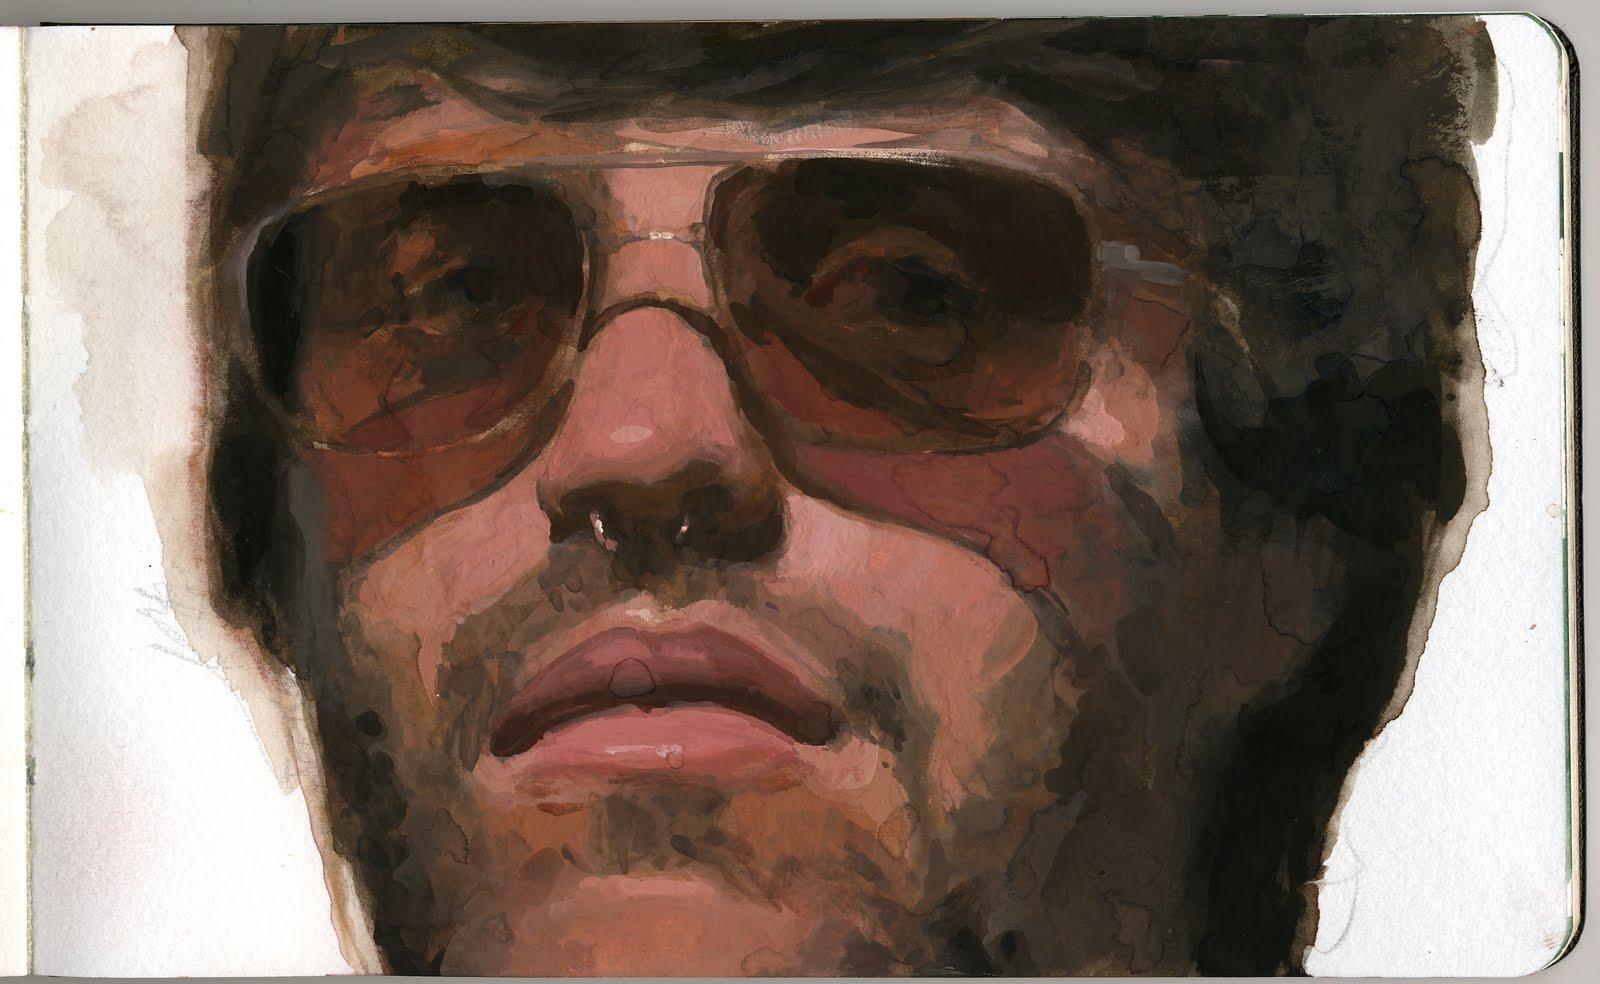 http://4.bp.blogspot.com/_BThm8AD74q0/TOZO7dtG7KI/AAAAAAAAAJ8/mMqSGGuDFIc/s1600/Gouache-Aaron.jpg